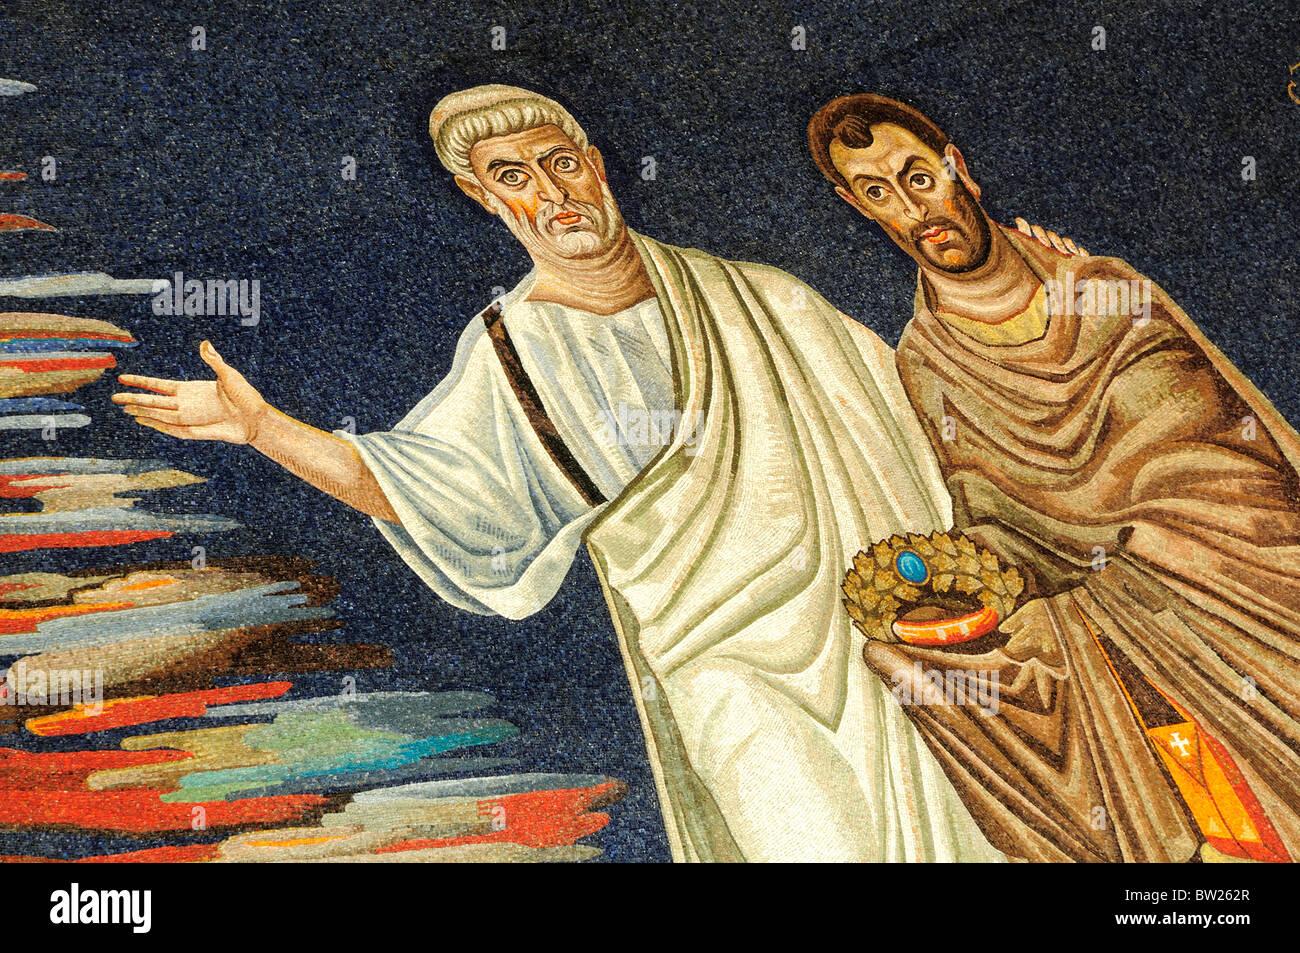 Mosaic detail of Saints, Basilica of St Cosmas & Damian, Foro Romano - Stock Image